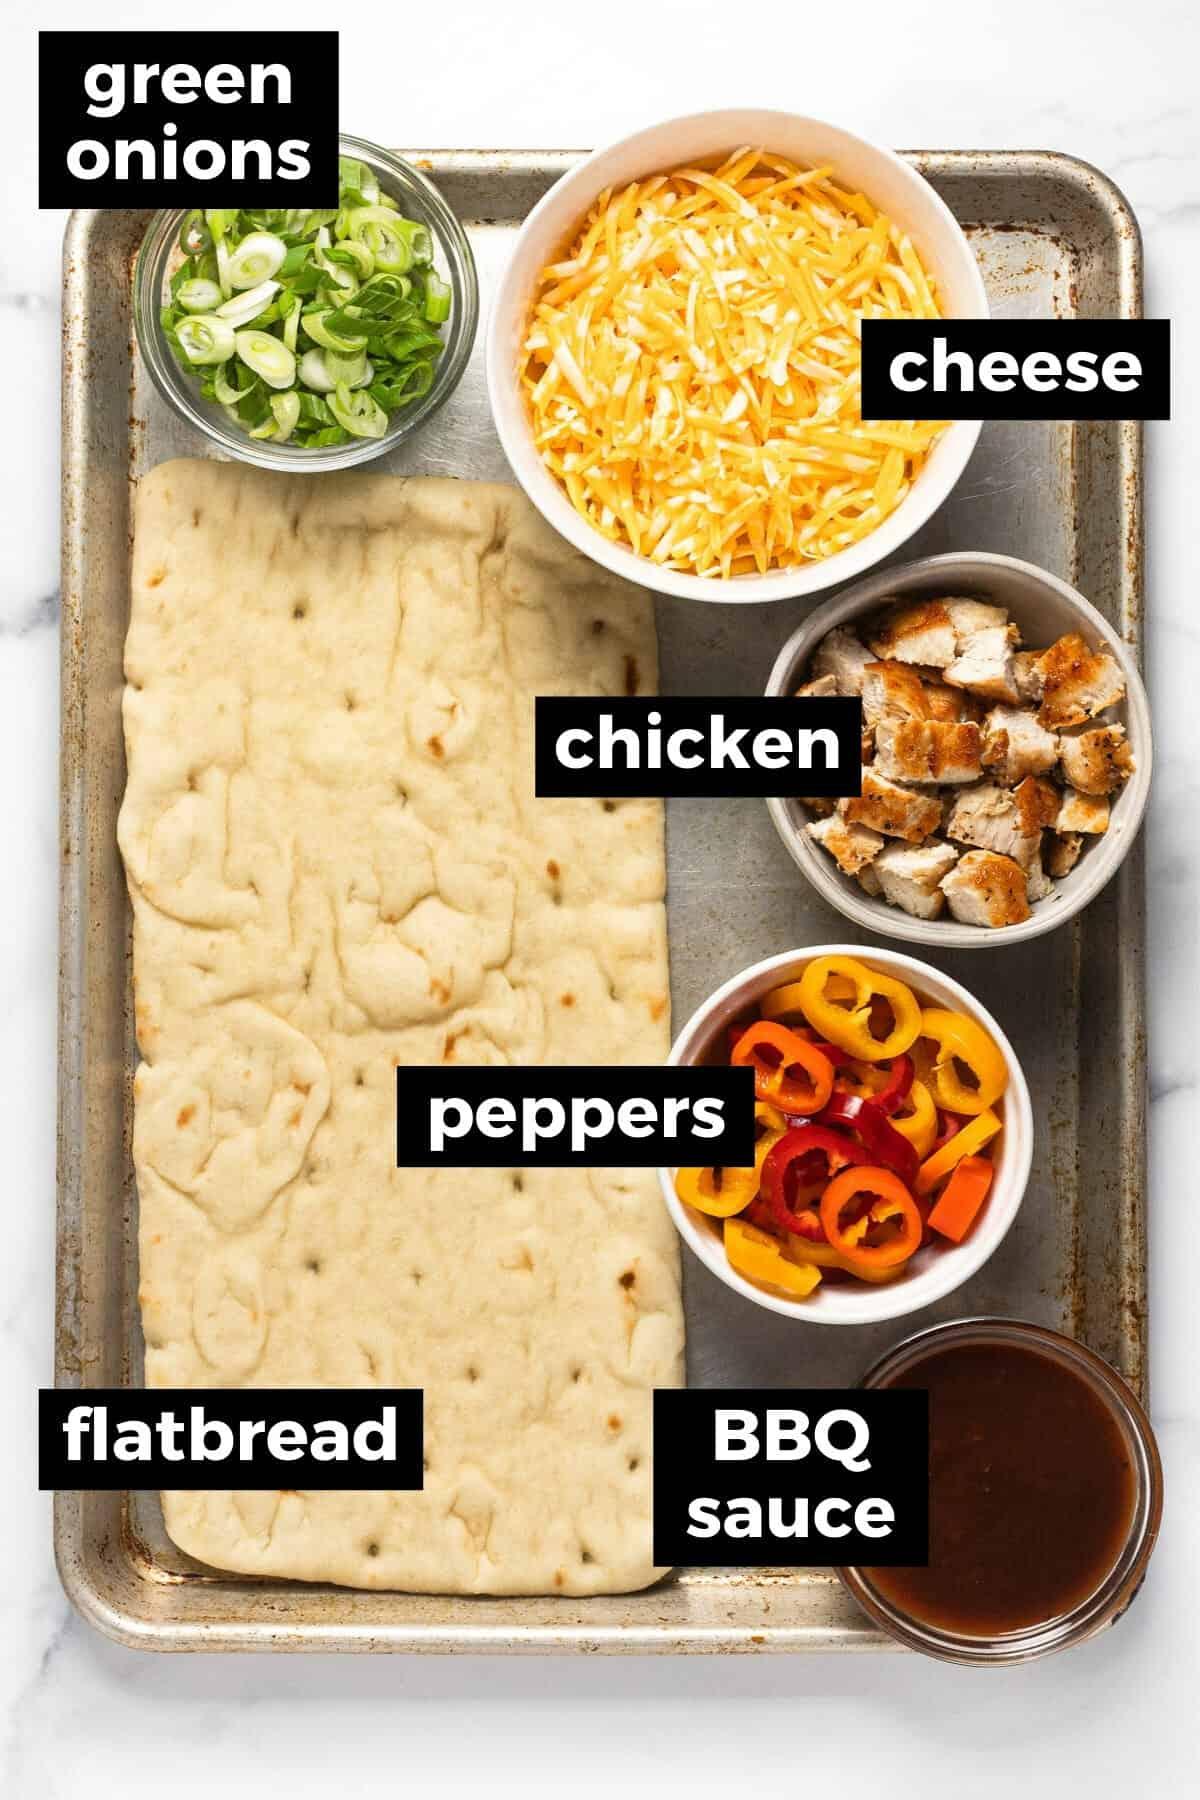 Baking sheet with ingredients to make BBQ chicken flatbread